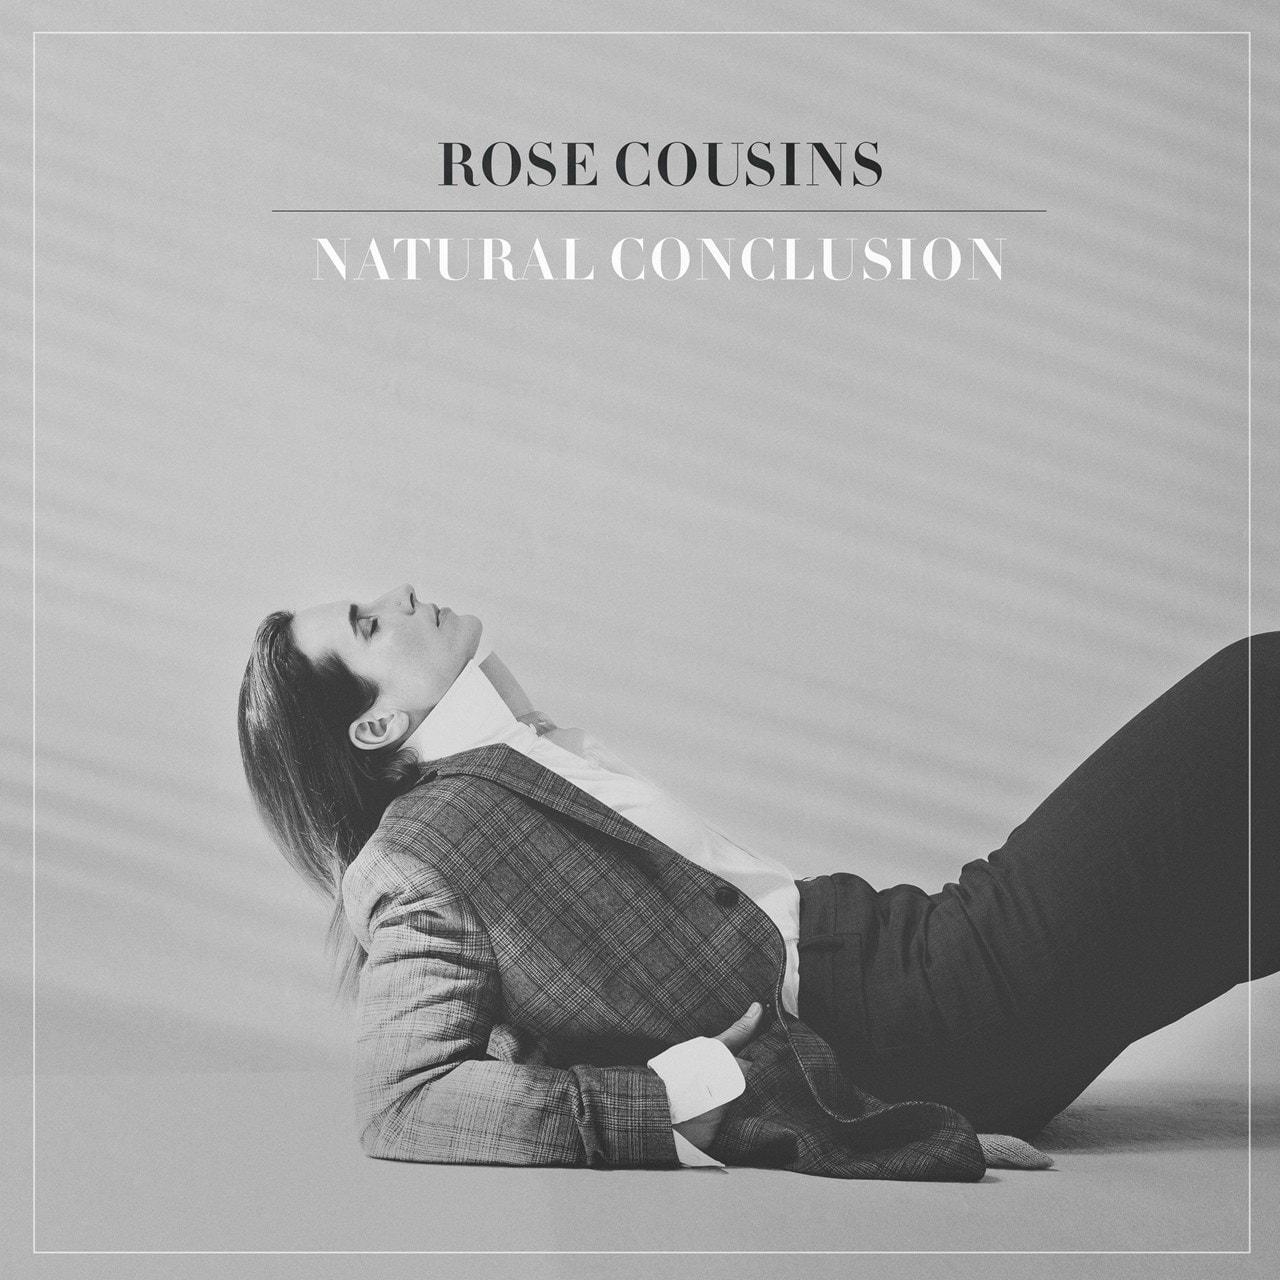 Natural Conclusion - 1